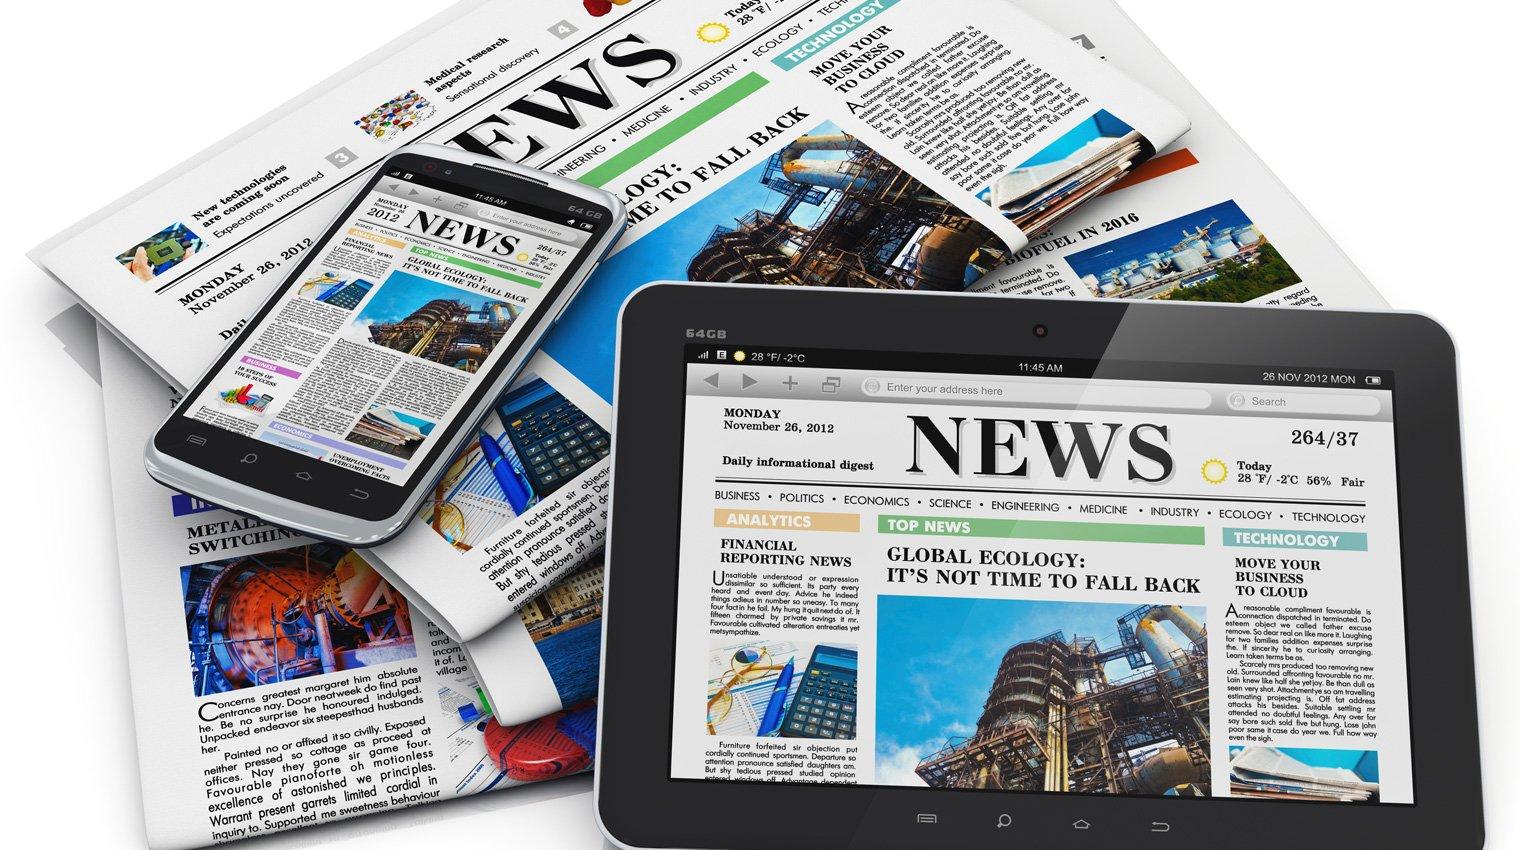 news media standards - 各新聞のインターネットサイトで見られる速報ニュースは誤報も多い!?